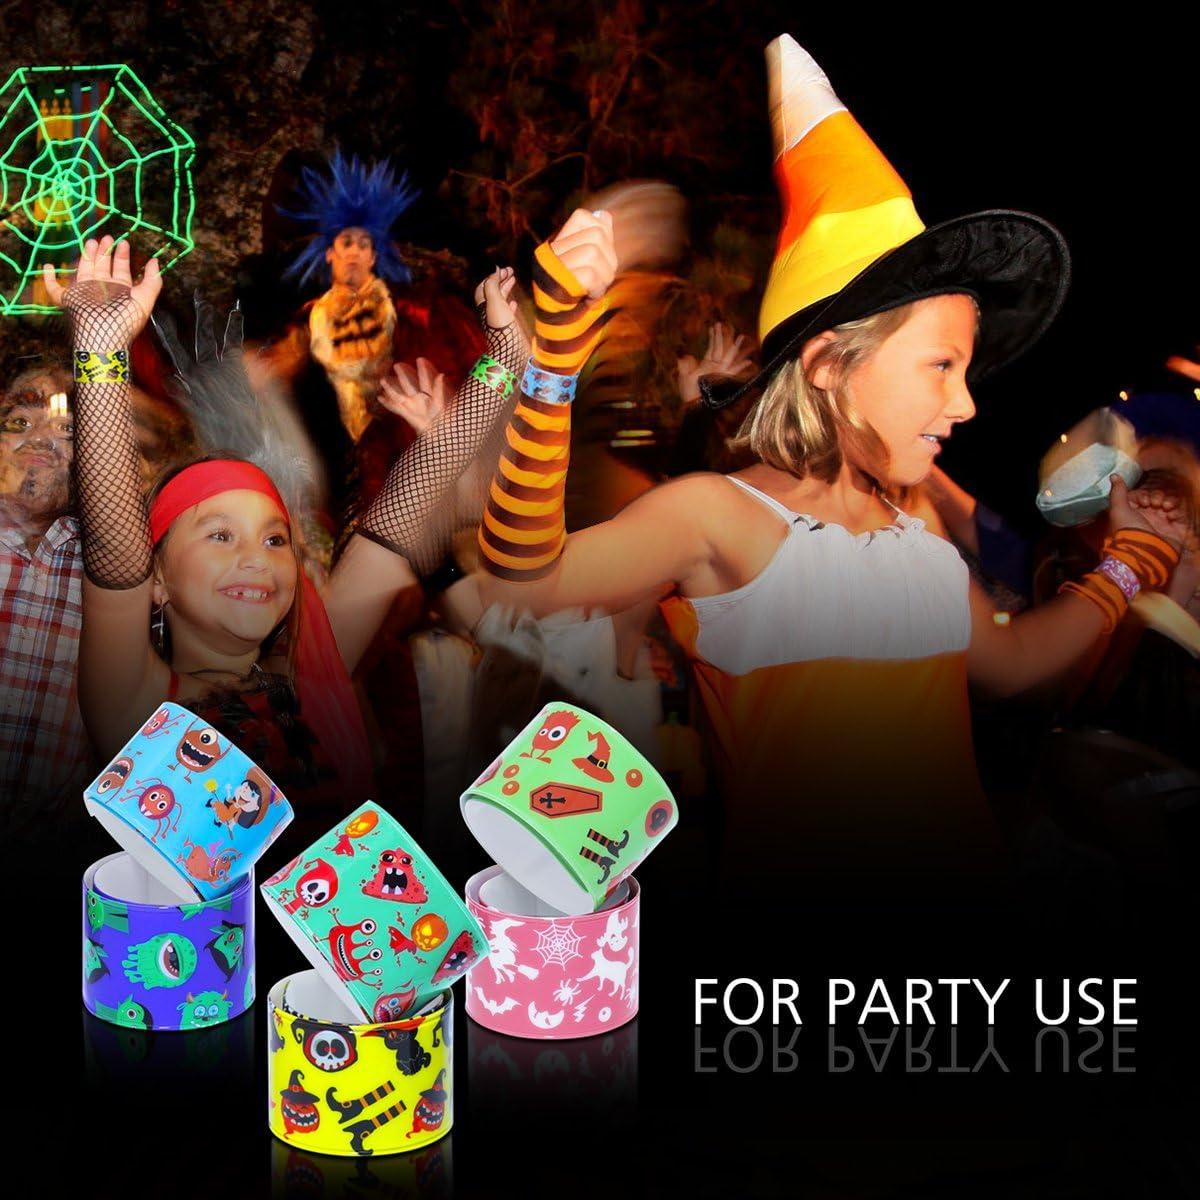 Halloween Slap Bracelets Pack Assorted Slap Bracelets Wristbands for Halloween Wrist Decoration Party Favors for Kids